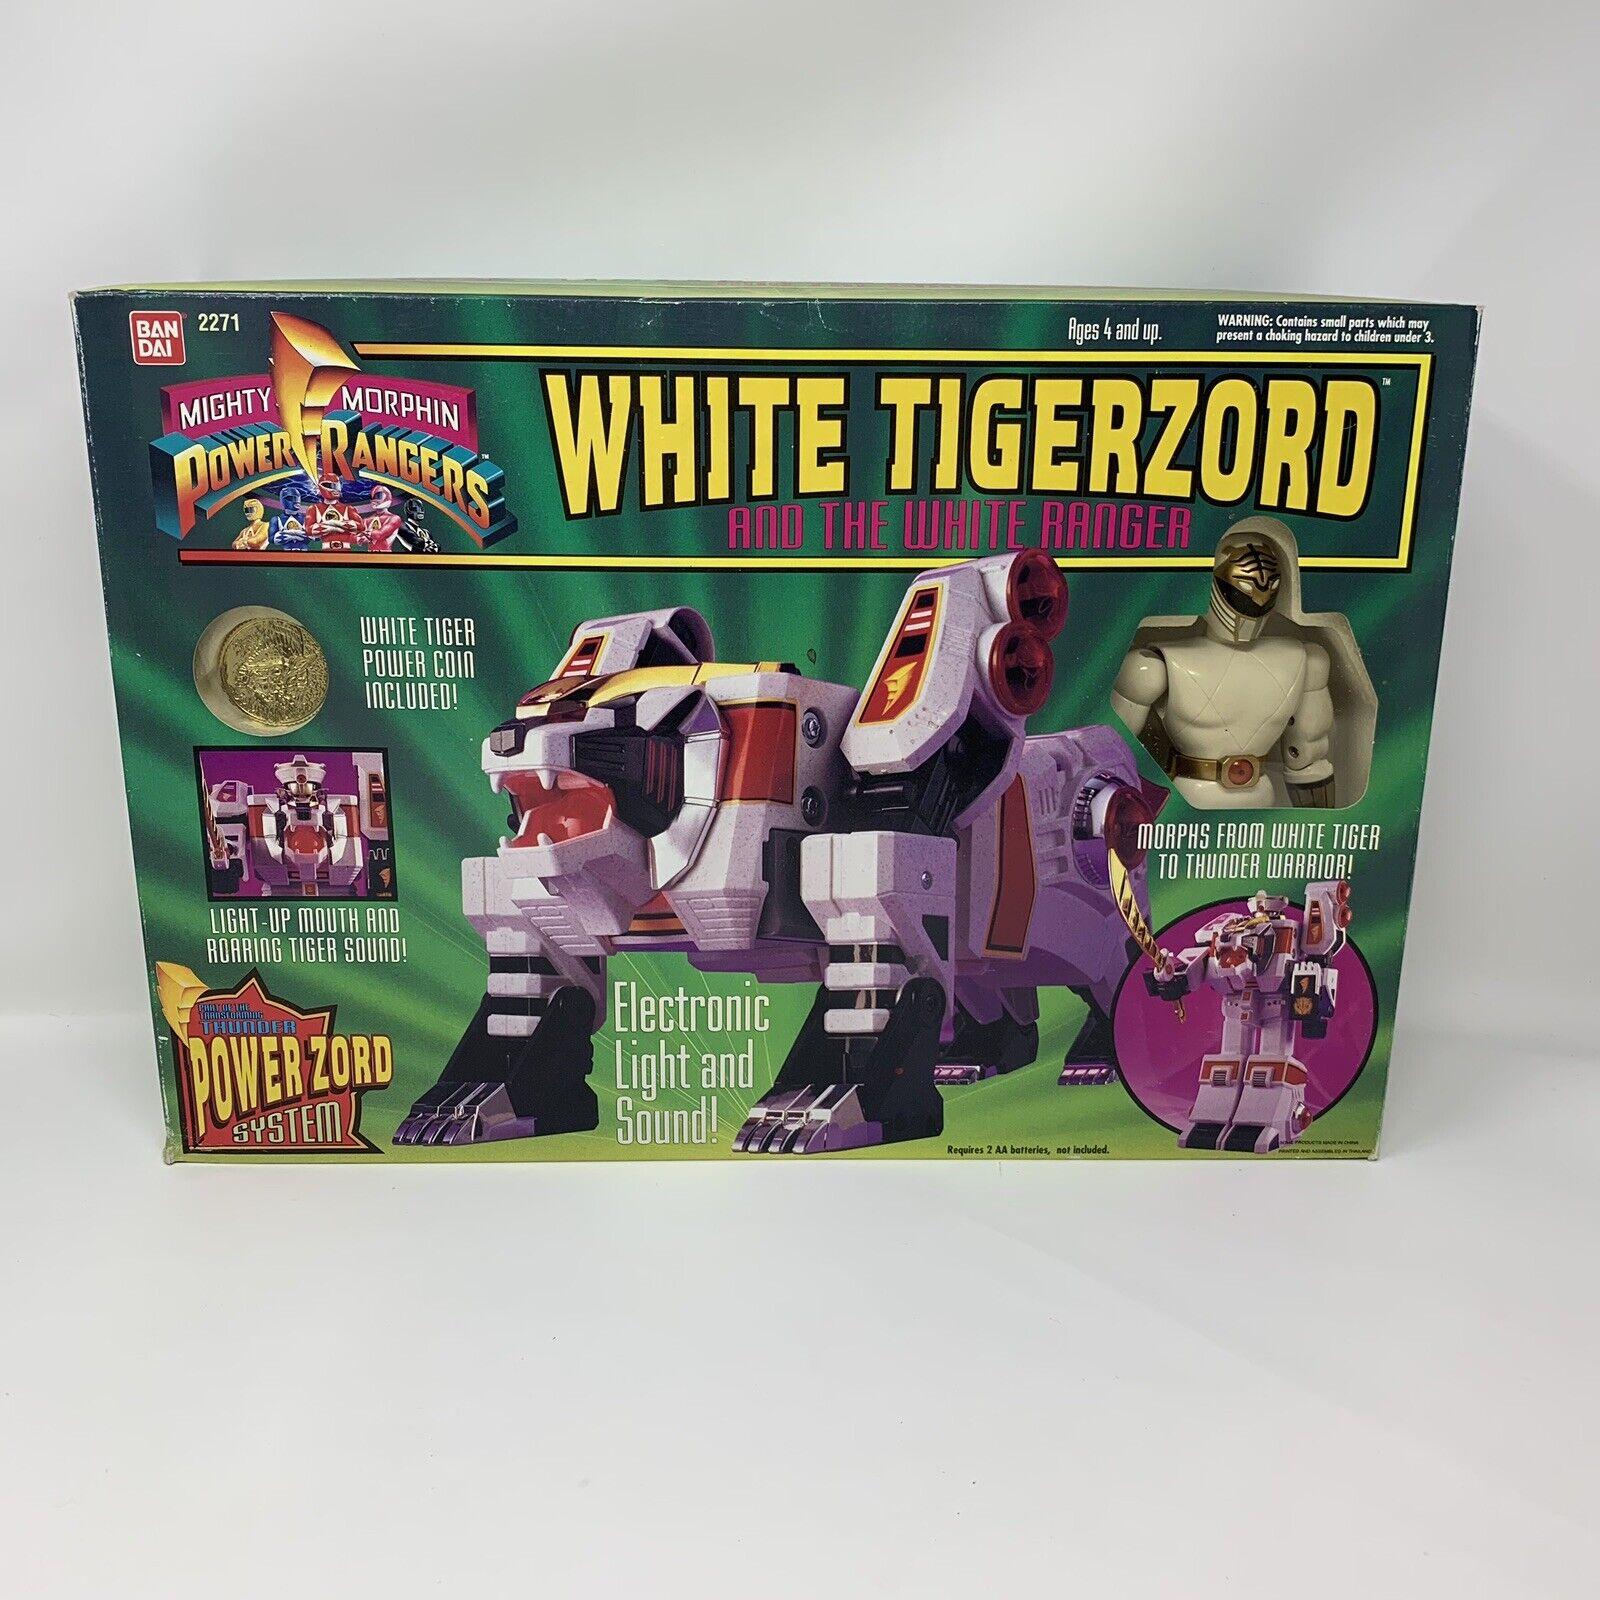 Bandai Mighty Morphin Power Rangers Tigerzord Con Ranger blancoo Ranger Mighty Morphin Power Rangers Sellado